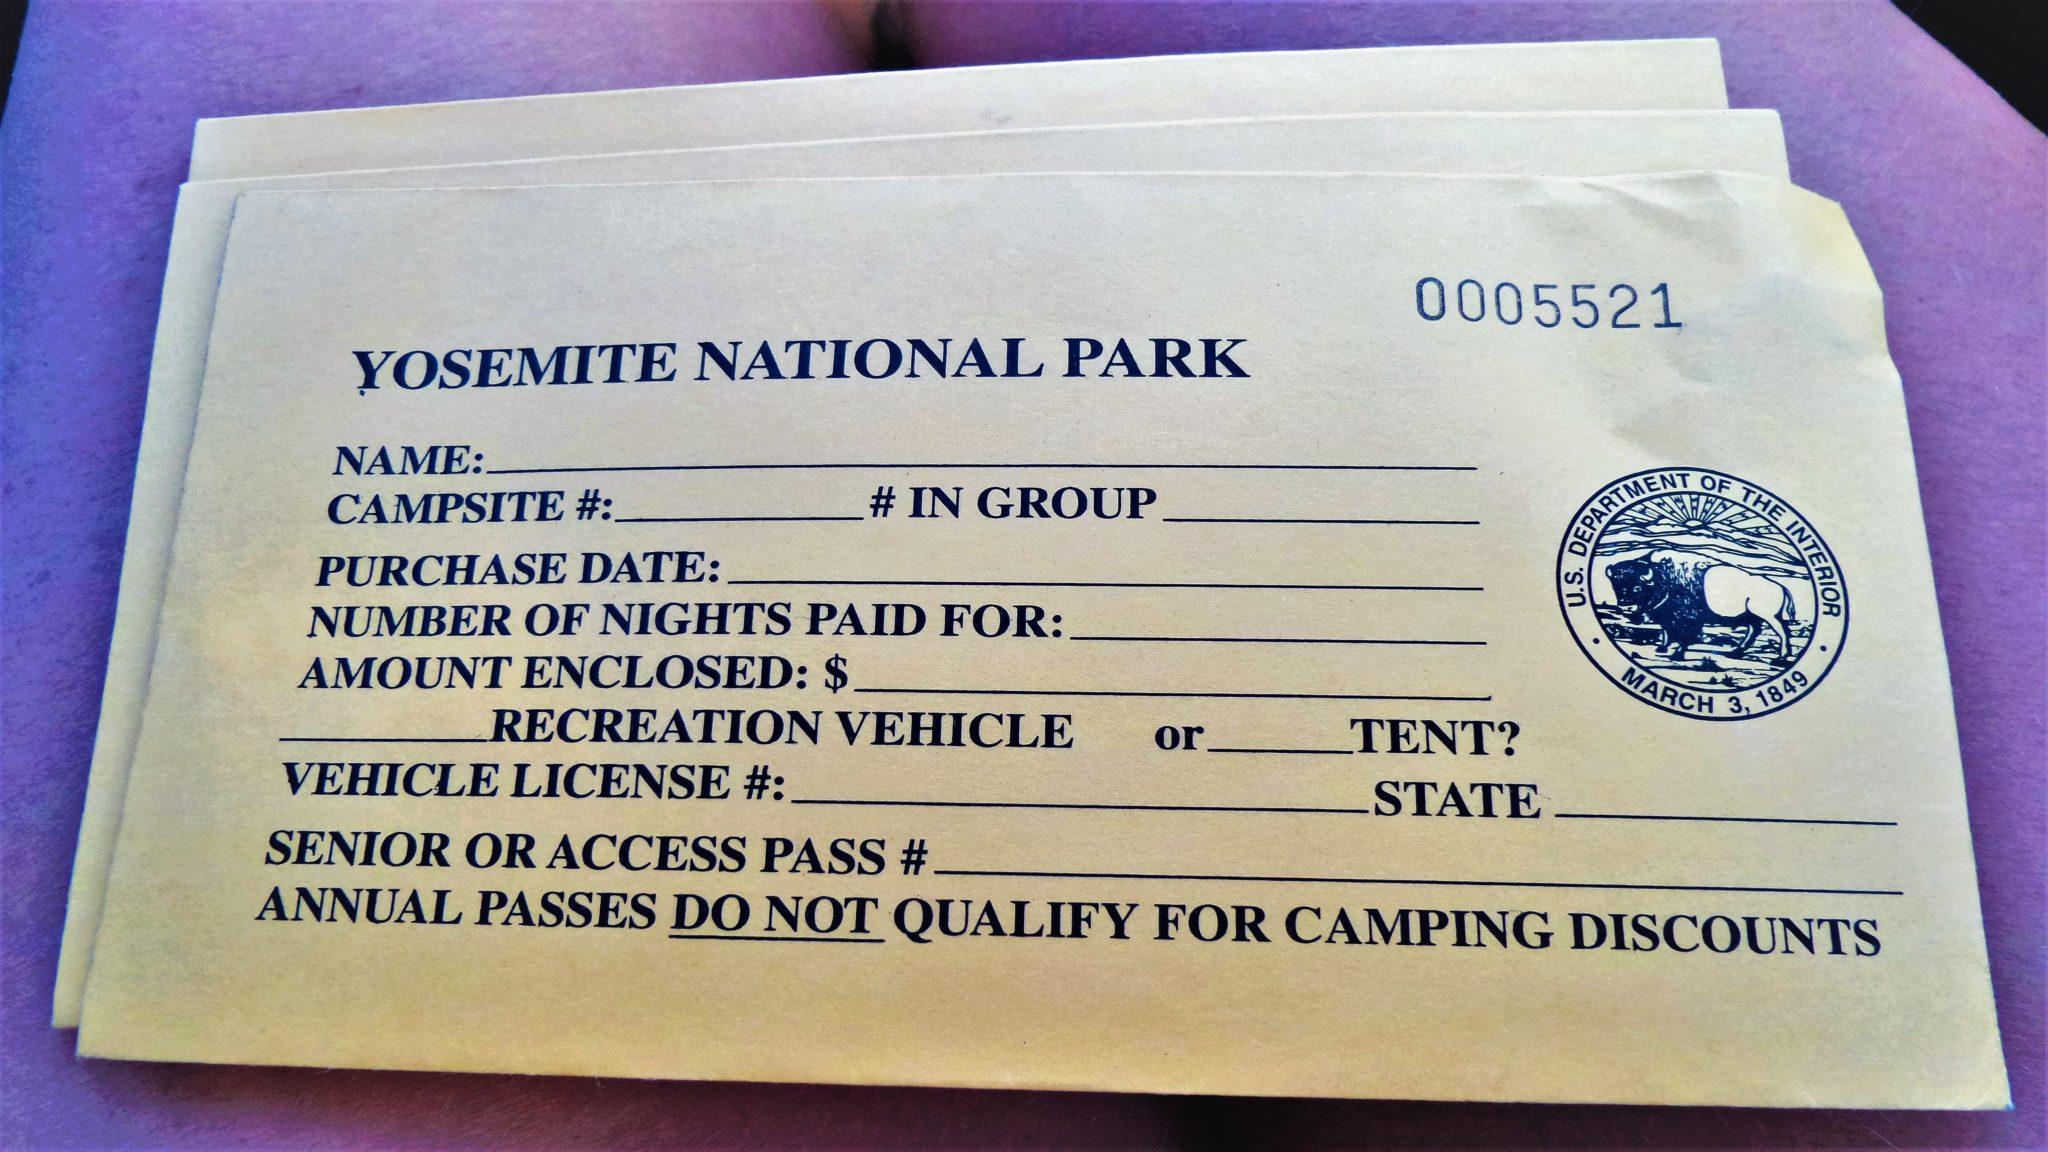 Yosemite National Park camping receipt, California